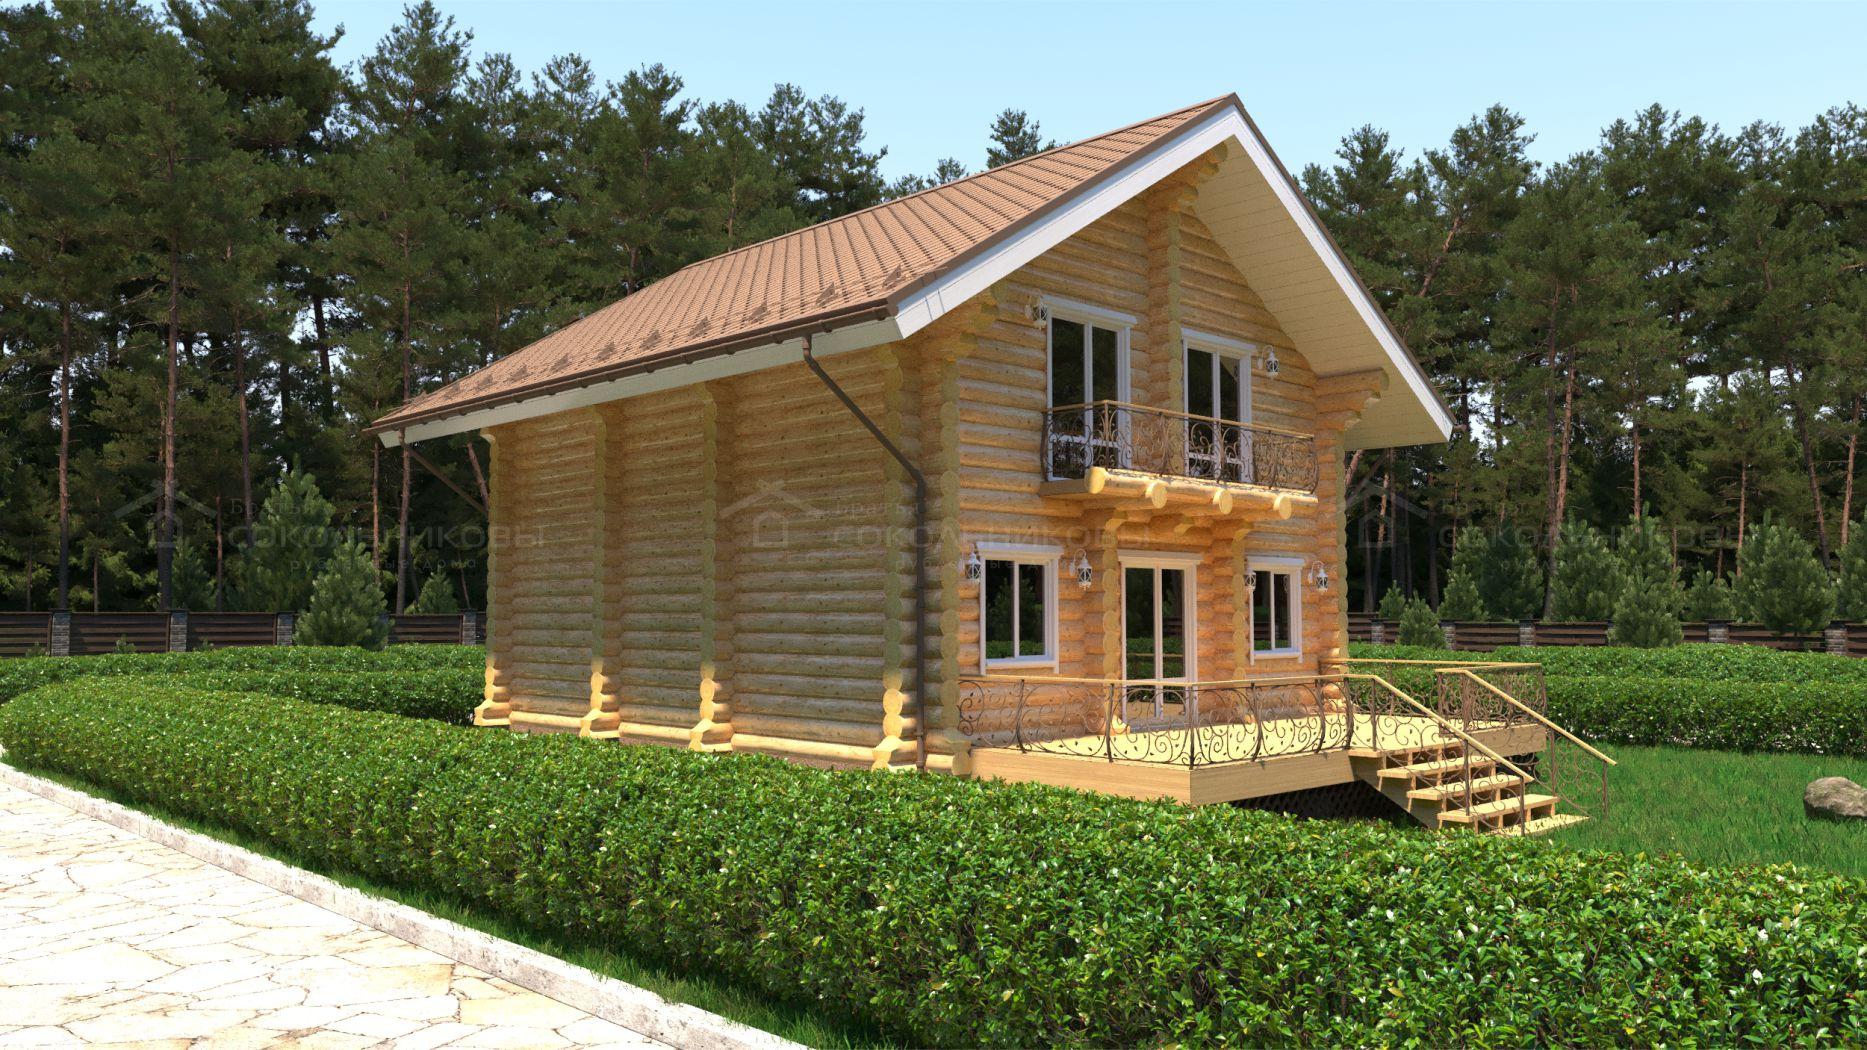 Дом-баня под рубанок, 130 кв. м, фото 2